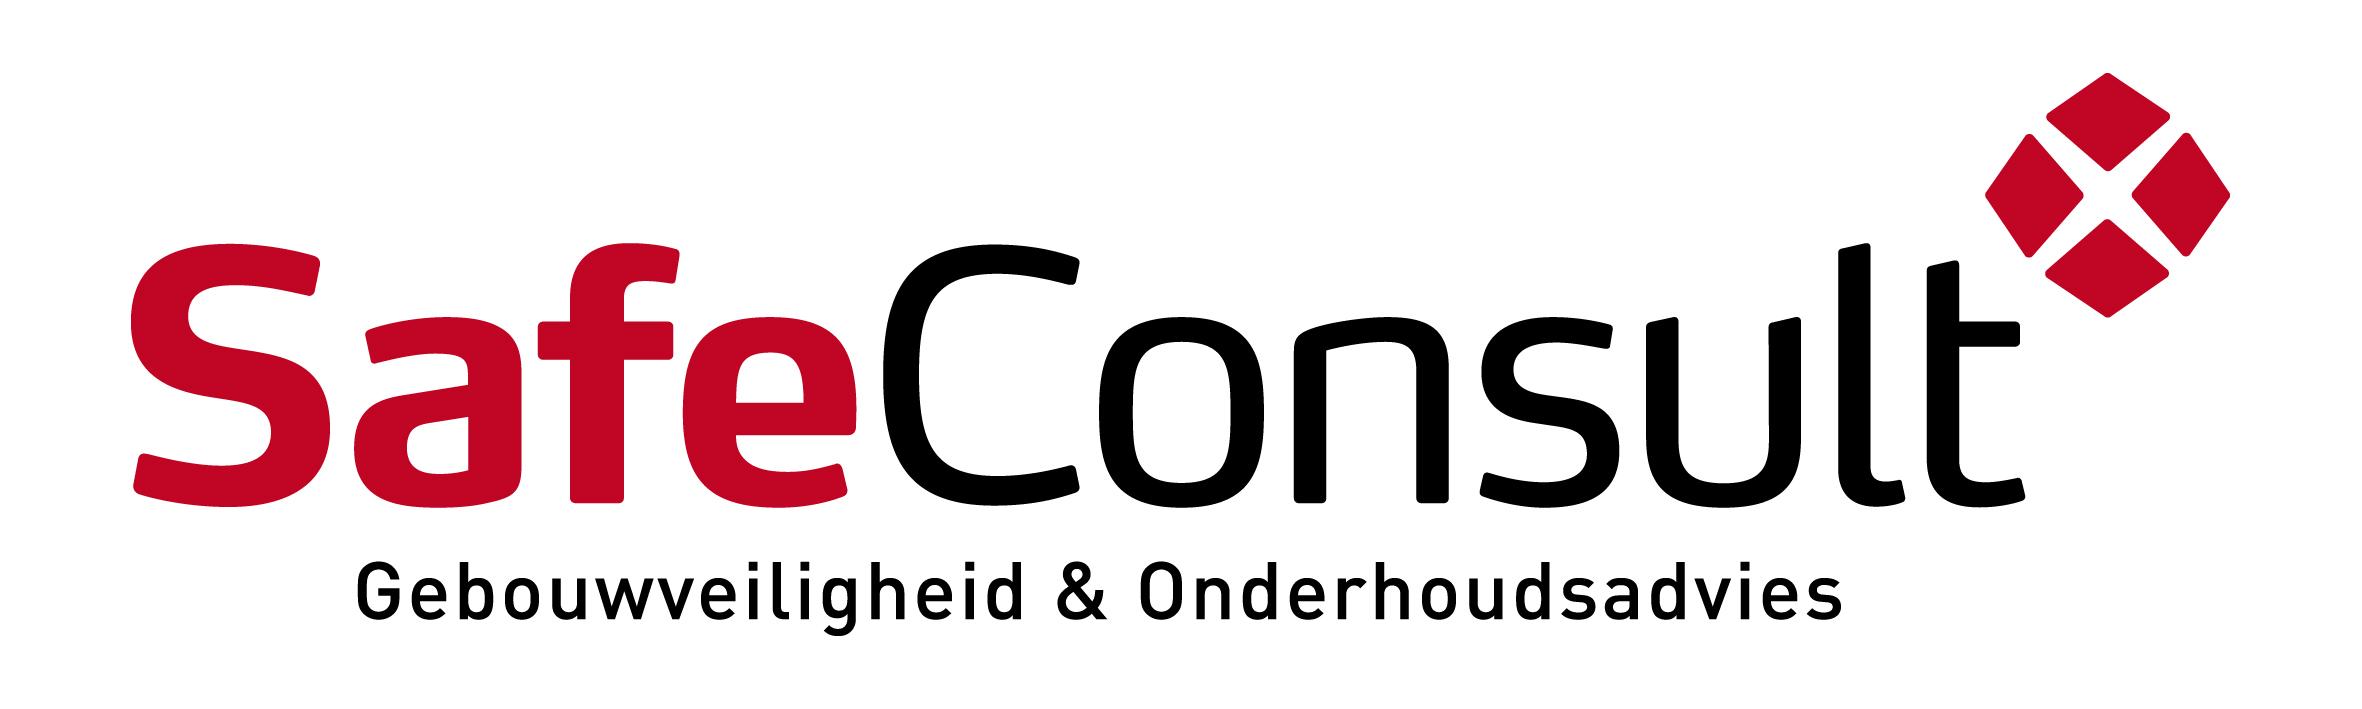 SafeConsult logo